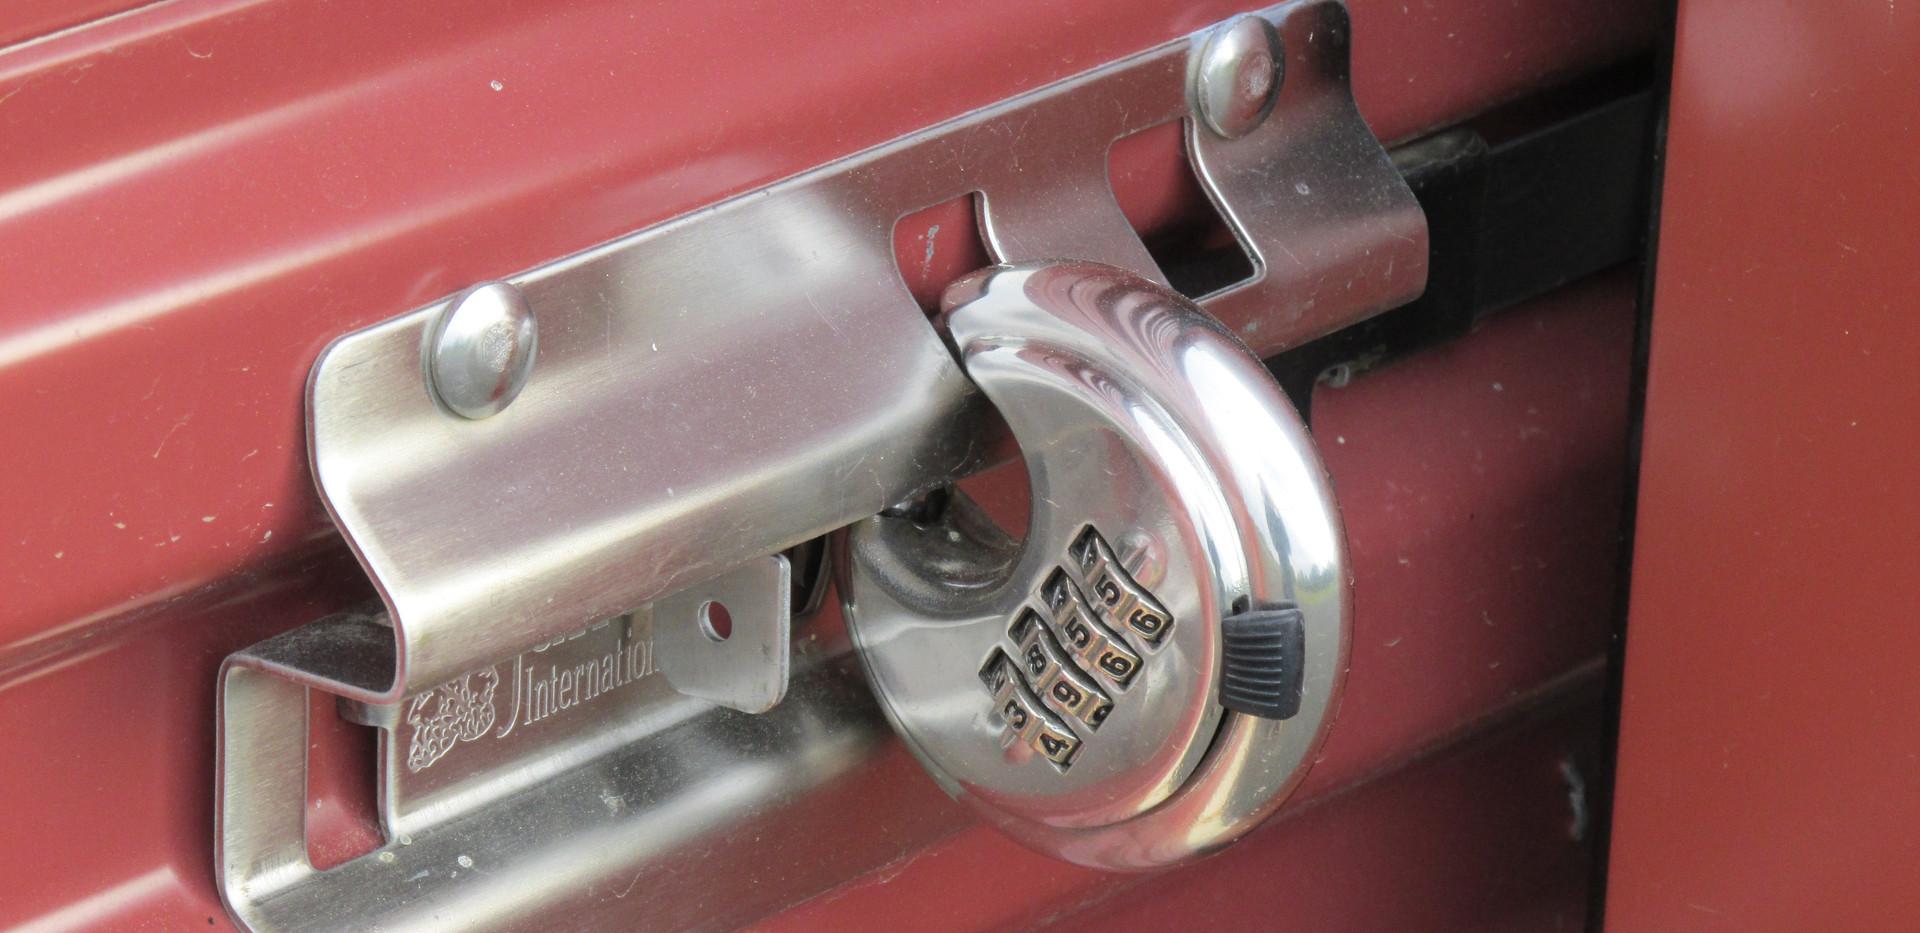 self-storage lock closeup pic 2.JPG